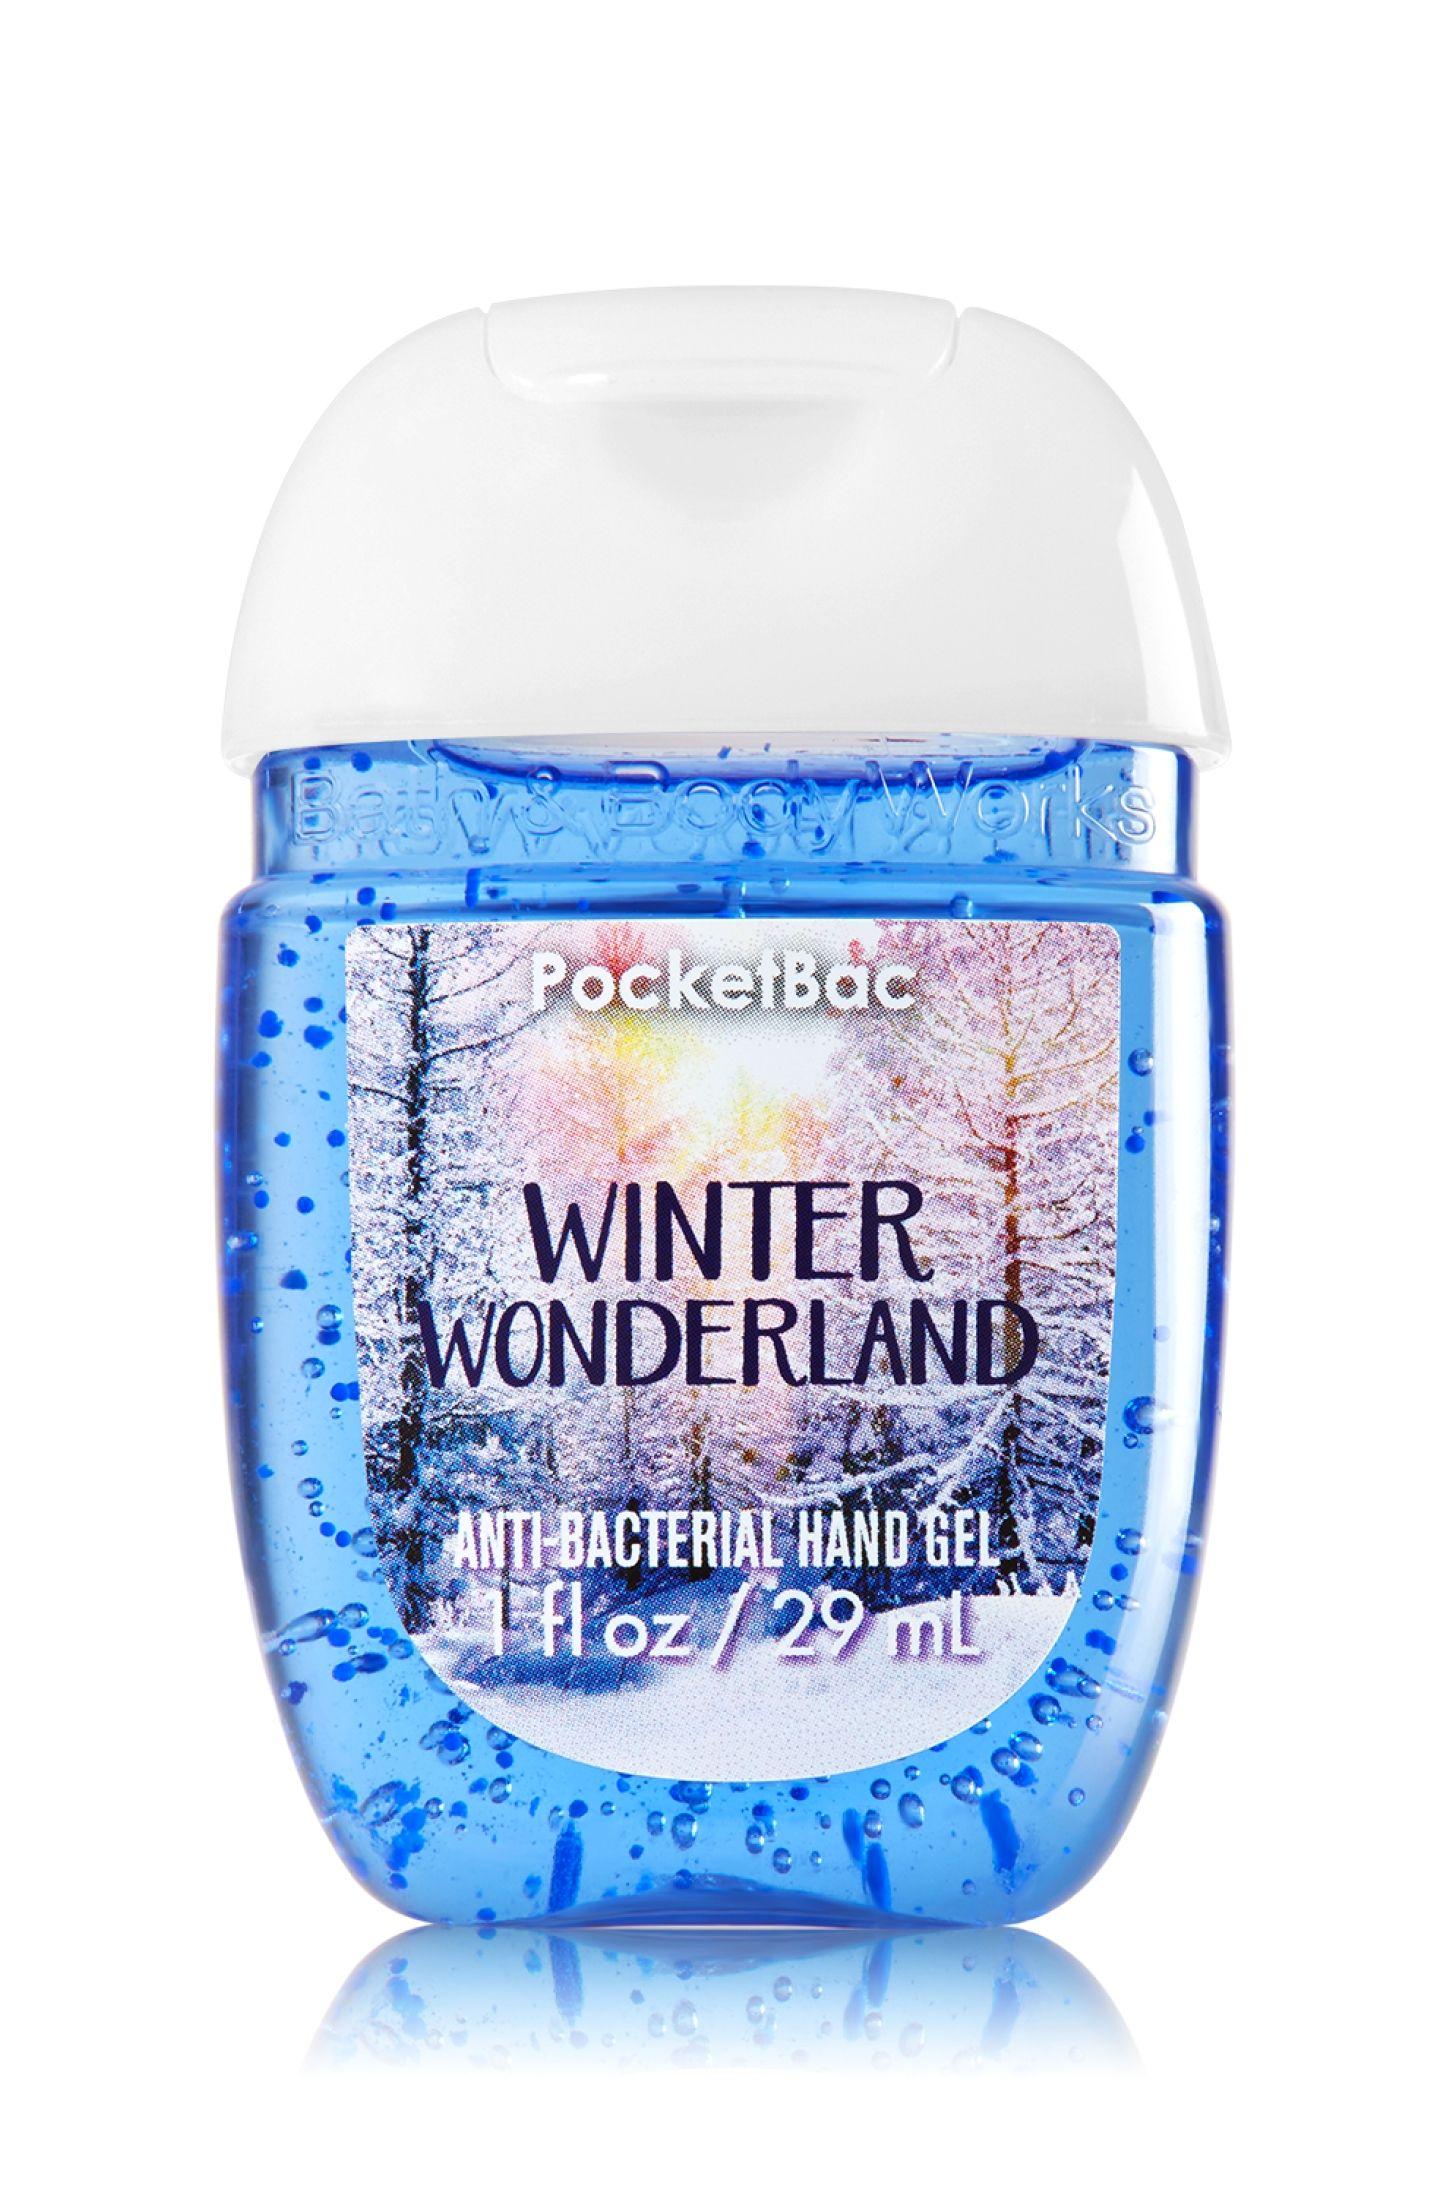 Winter Wonderland Pocketbac Sanitizer Bath And Body Works